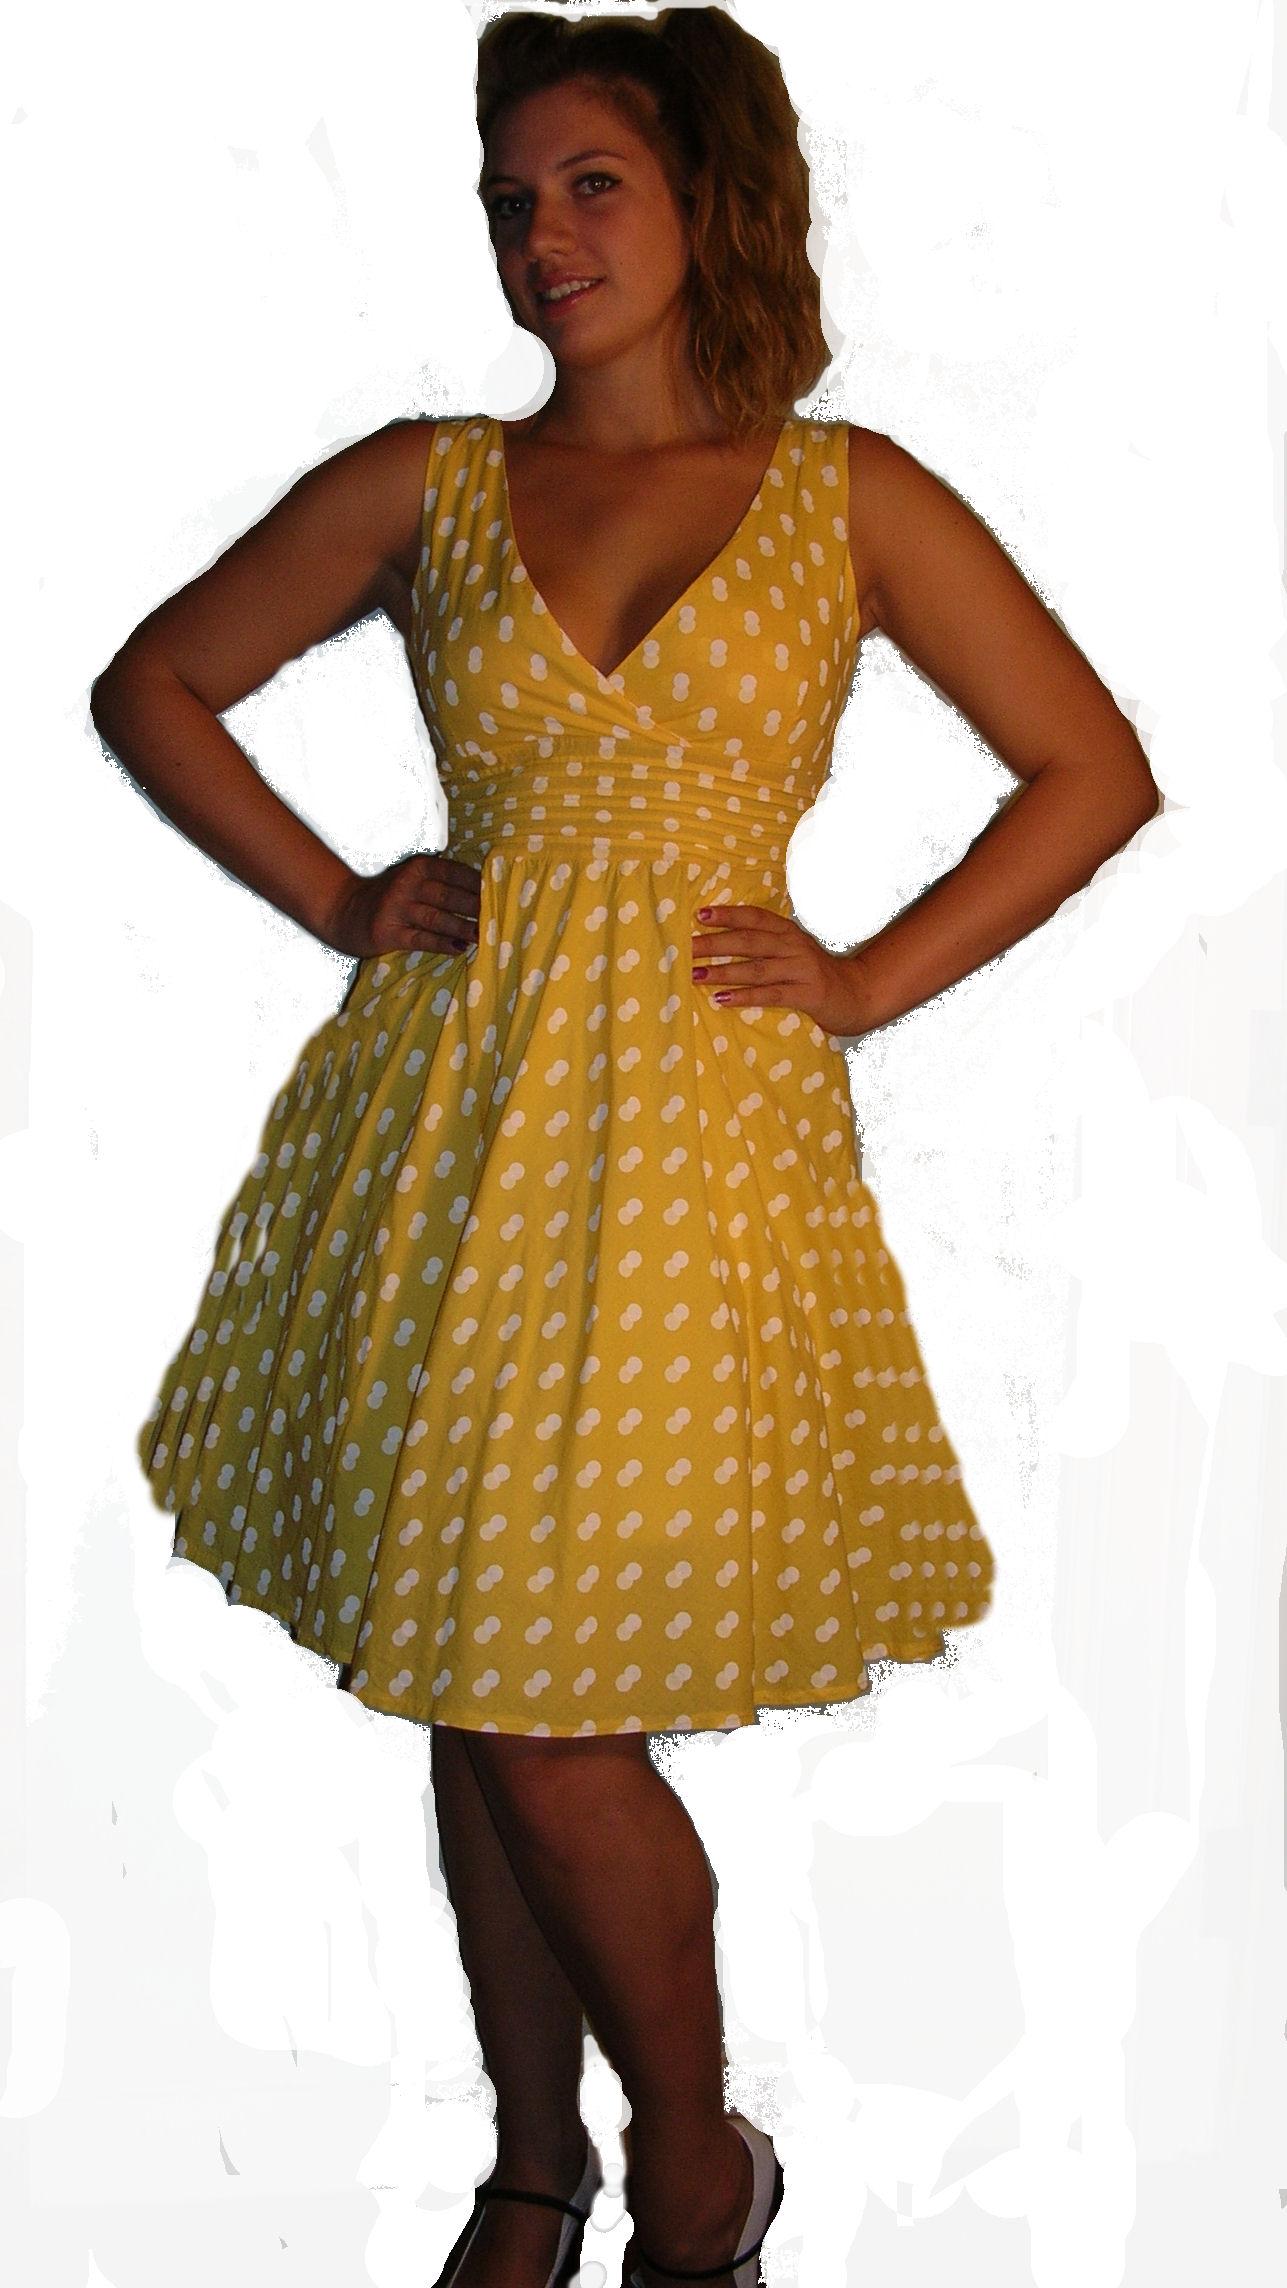 Sunshine-Yellow--White-Polka-Dot-50's-Dress-S